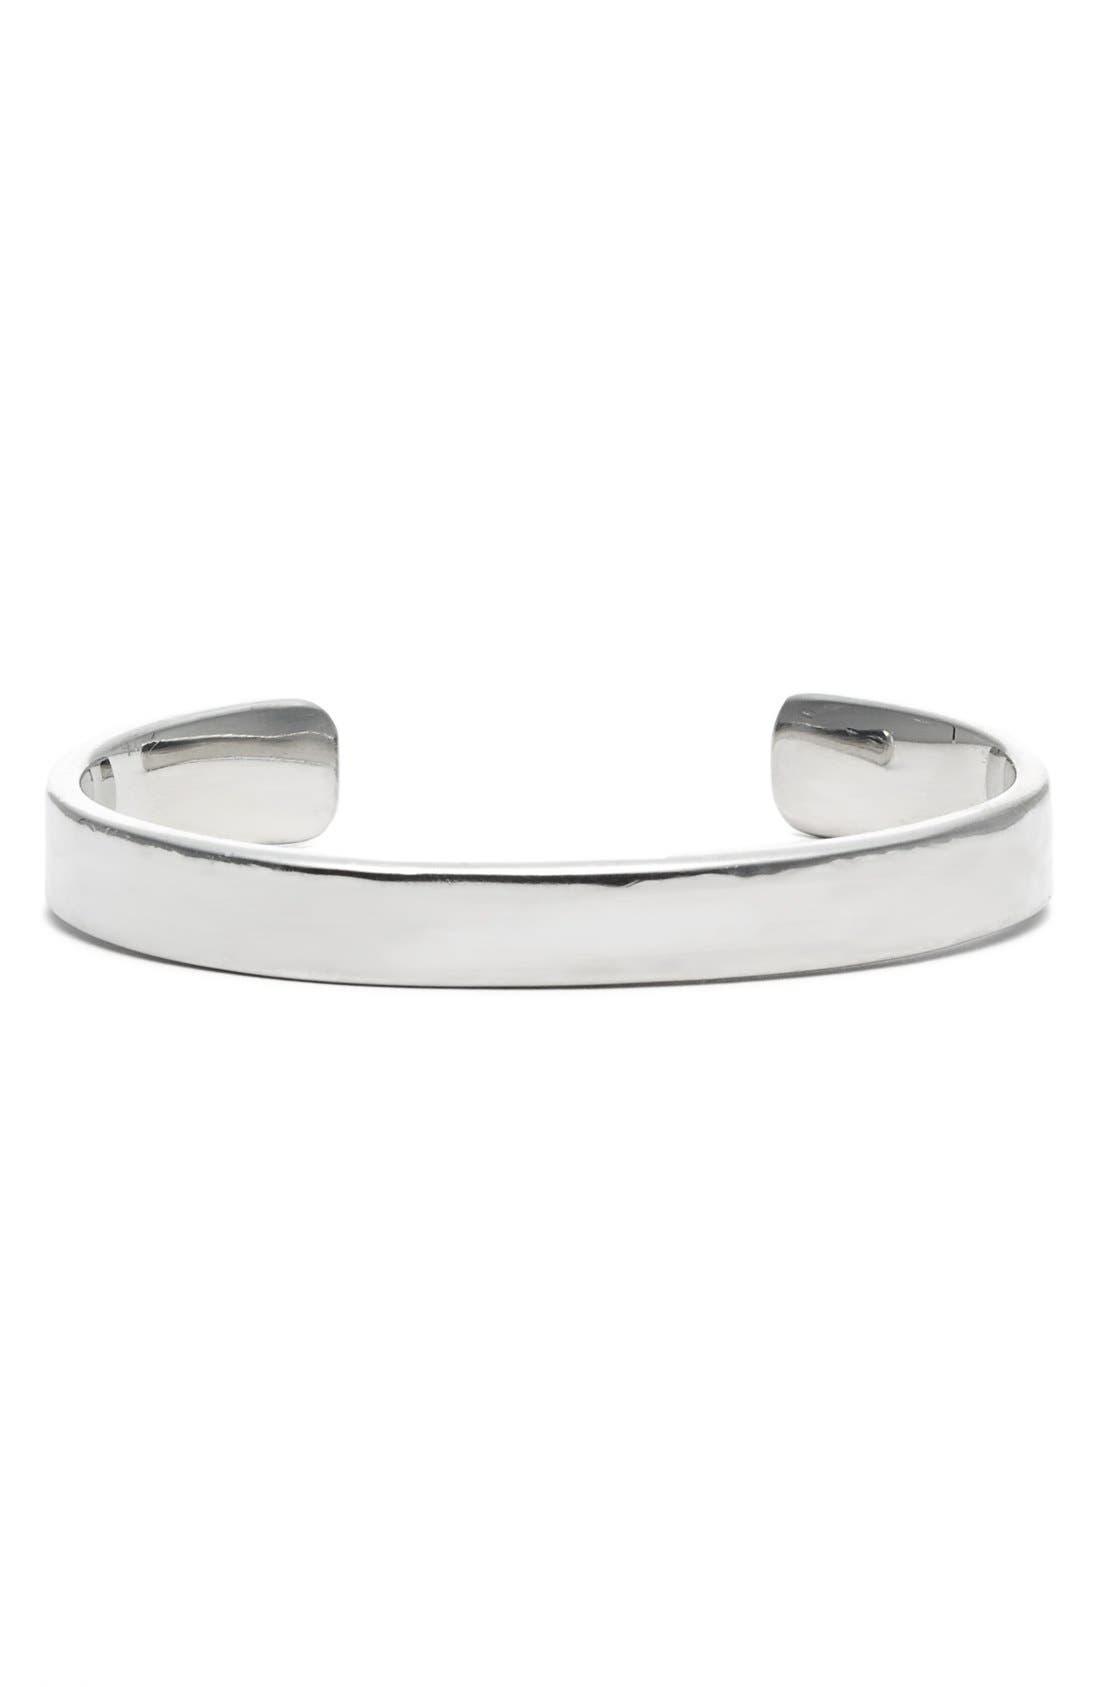 Main Image - Nordstrom Thin Wrist Cuff